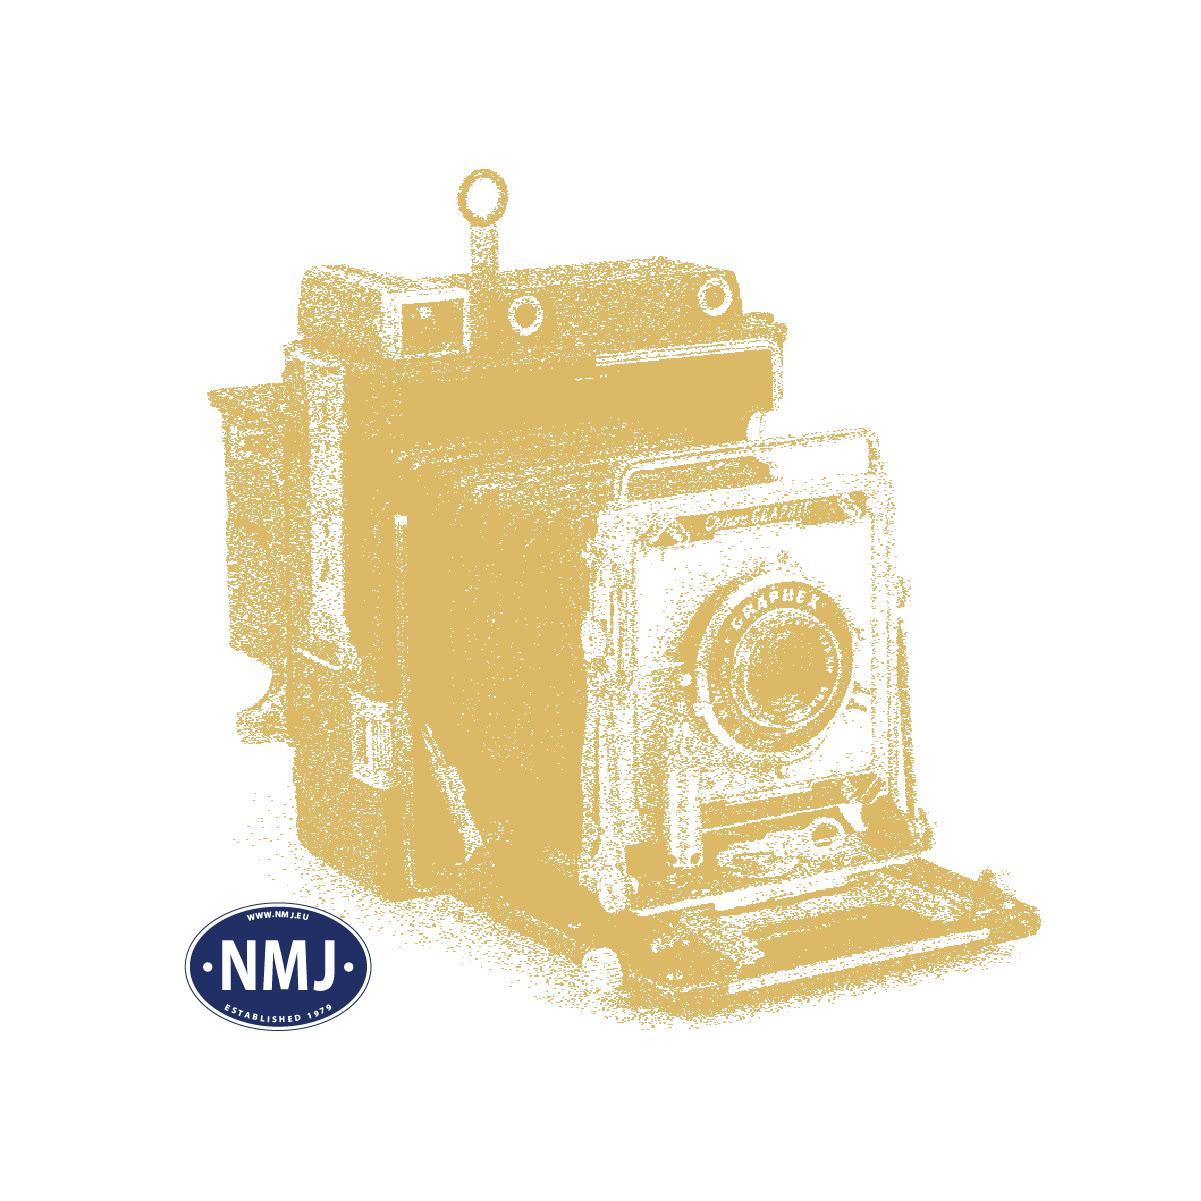 NMJT87.401 - NMJ Topline NSB El11b.2146, rot/schwarz, DC